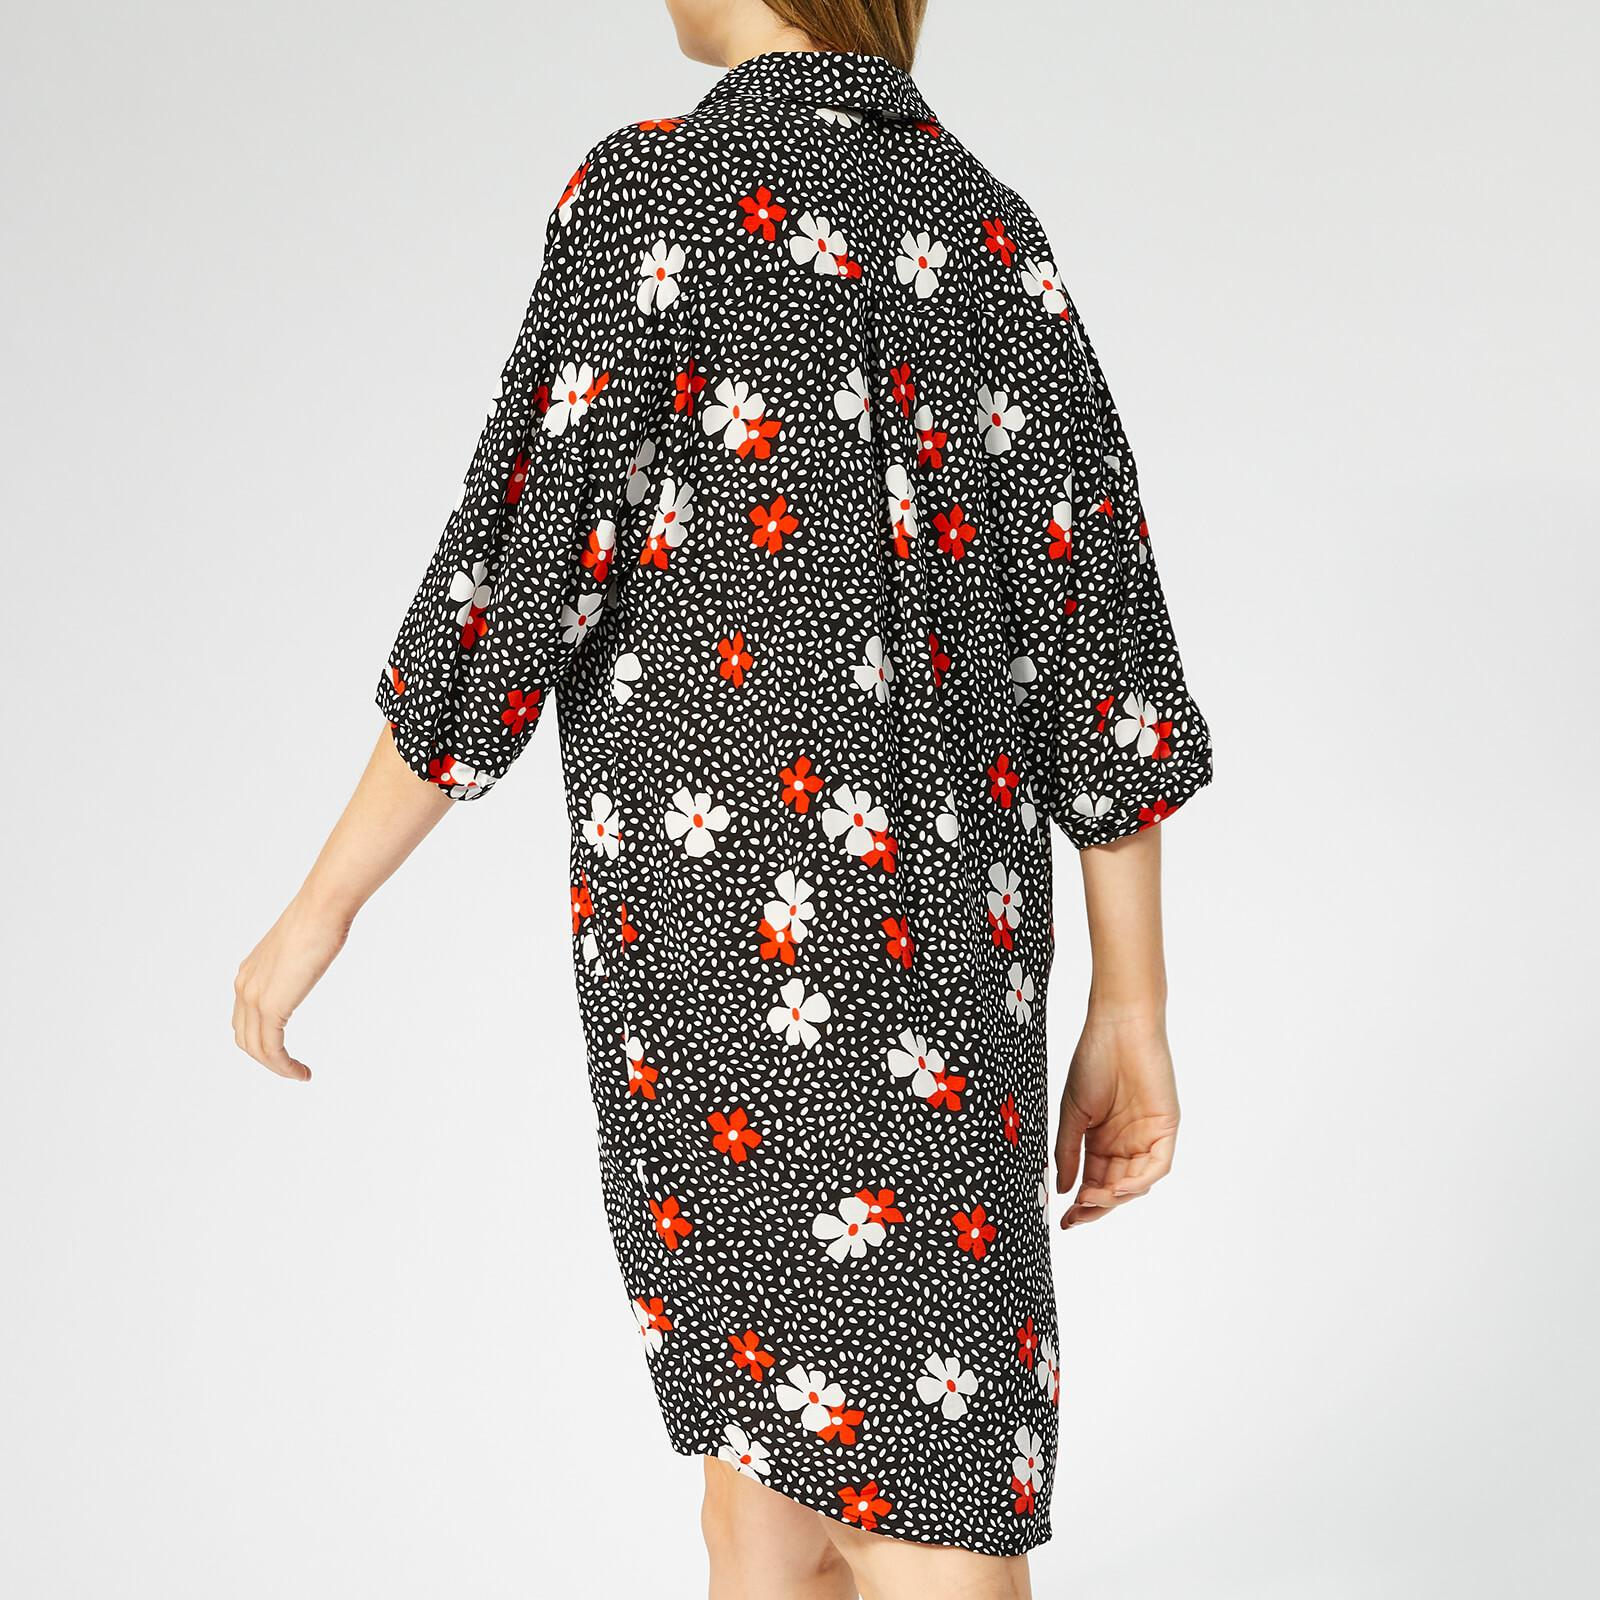 Whistles - Black Lola Confetti Floral Print Dress - Lyst. View fullscreen 616580f2a